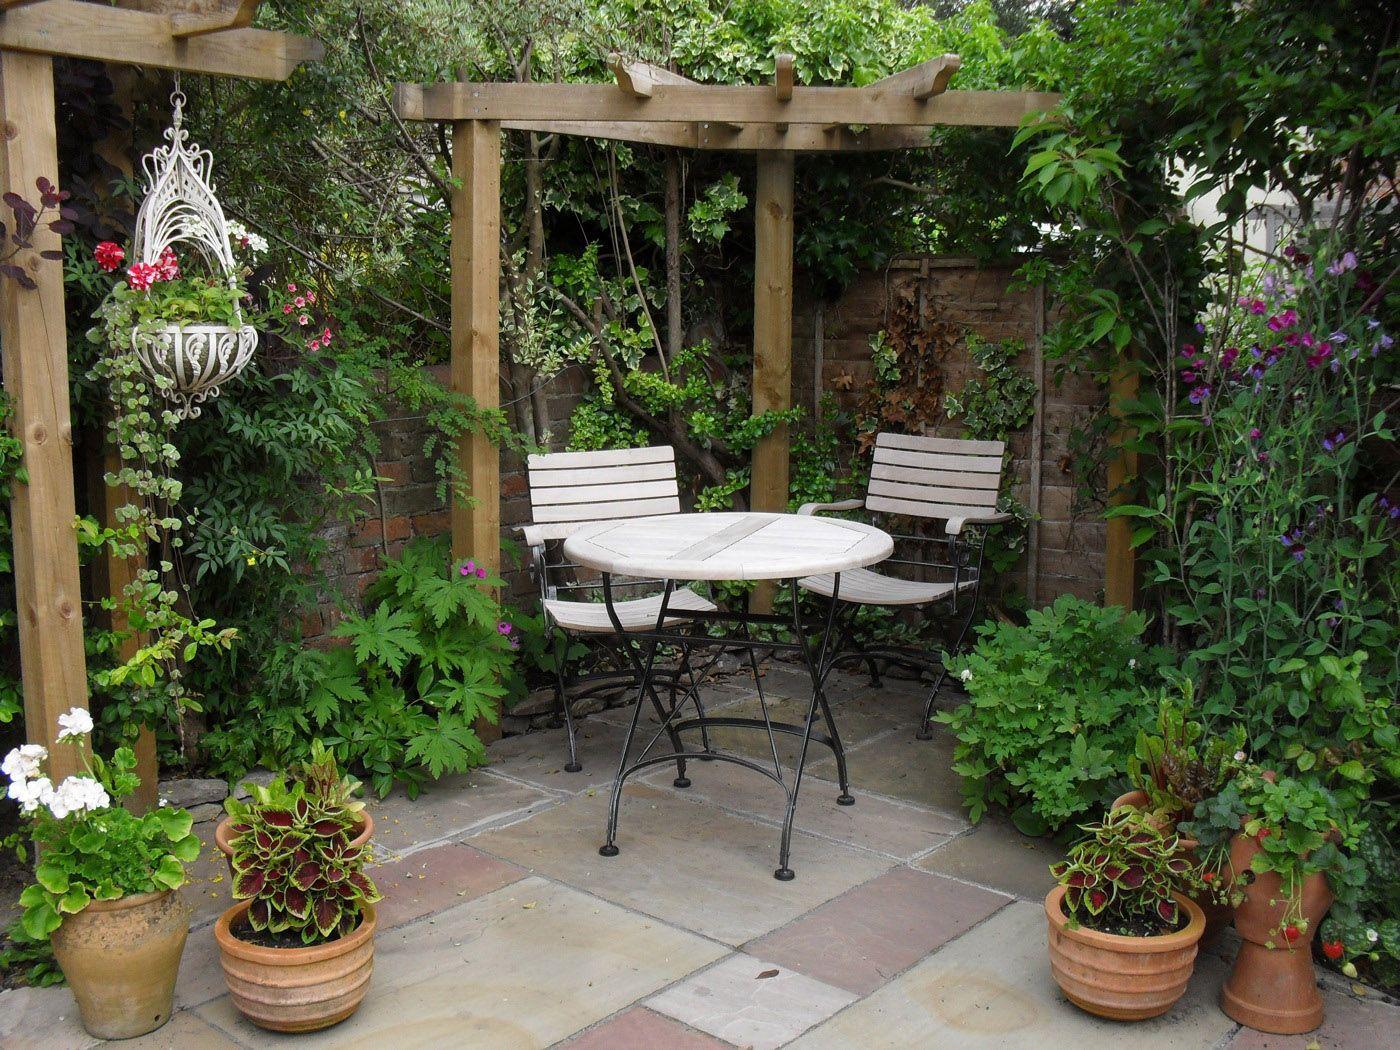 small patio ideas 24 NFQDEET